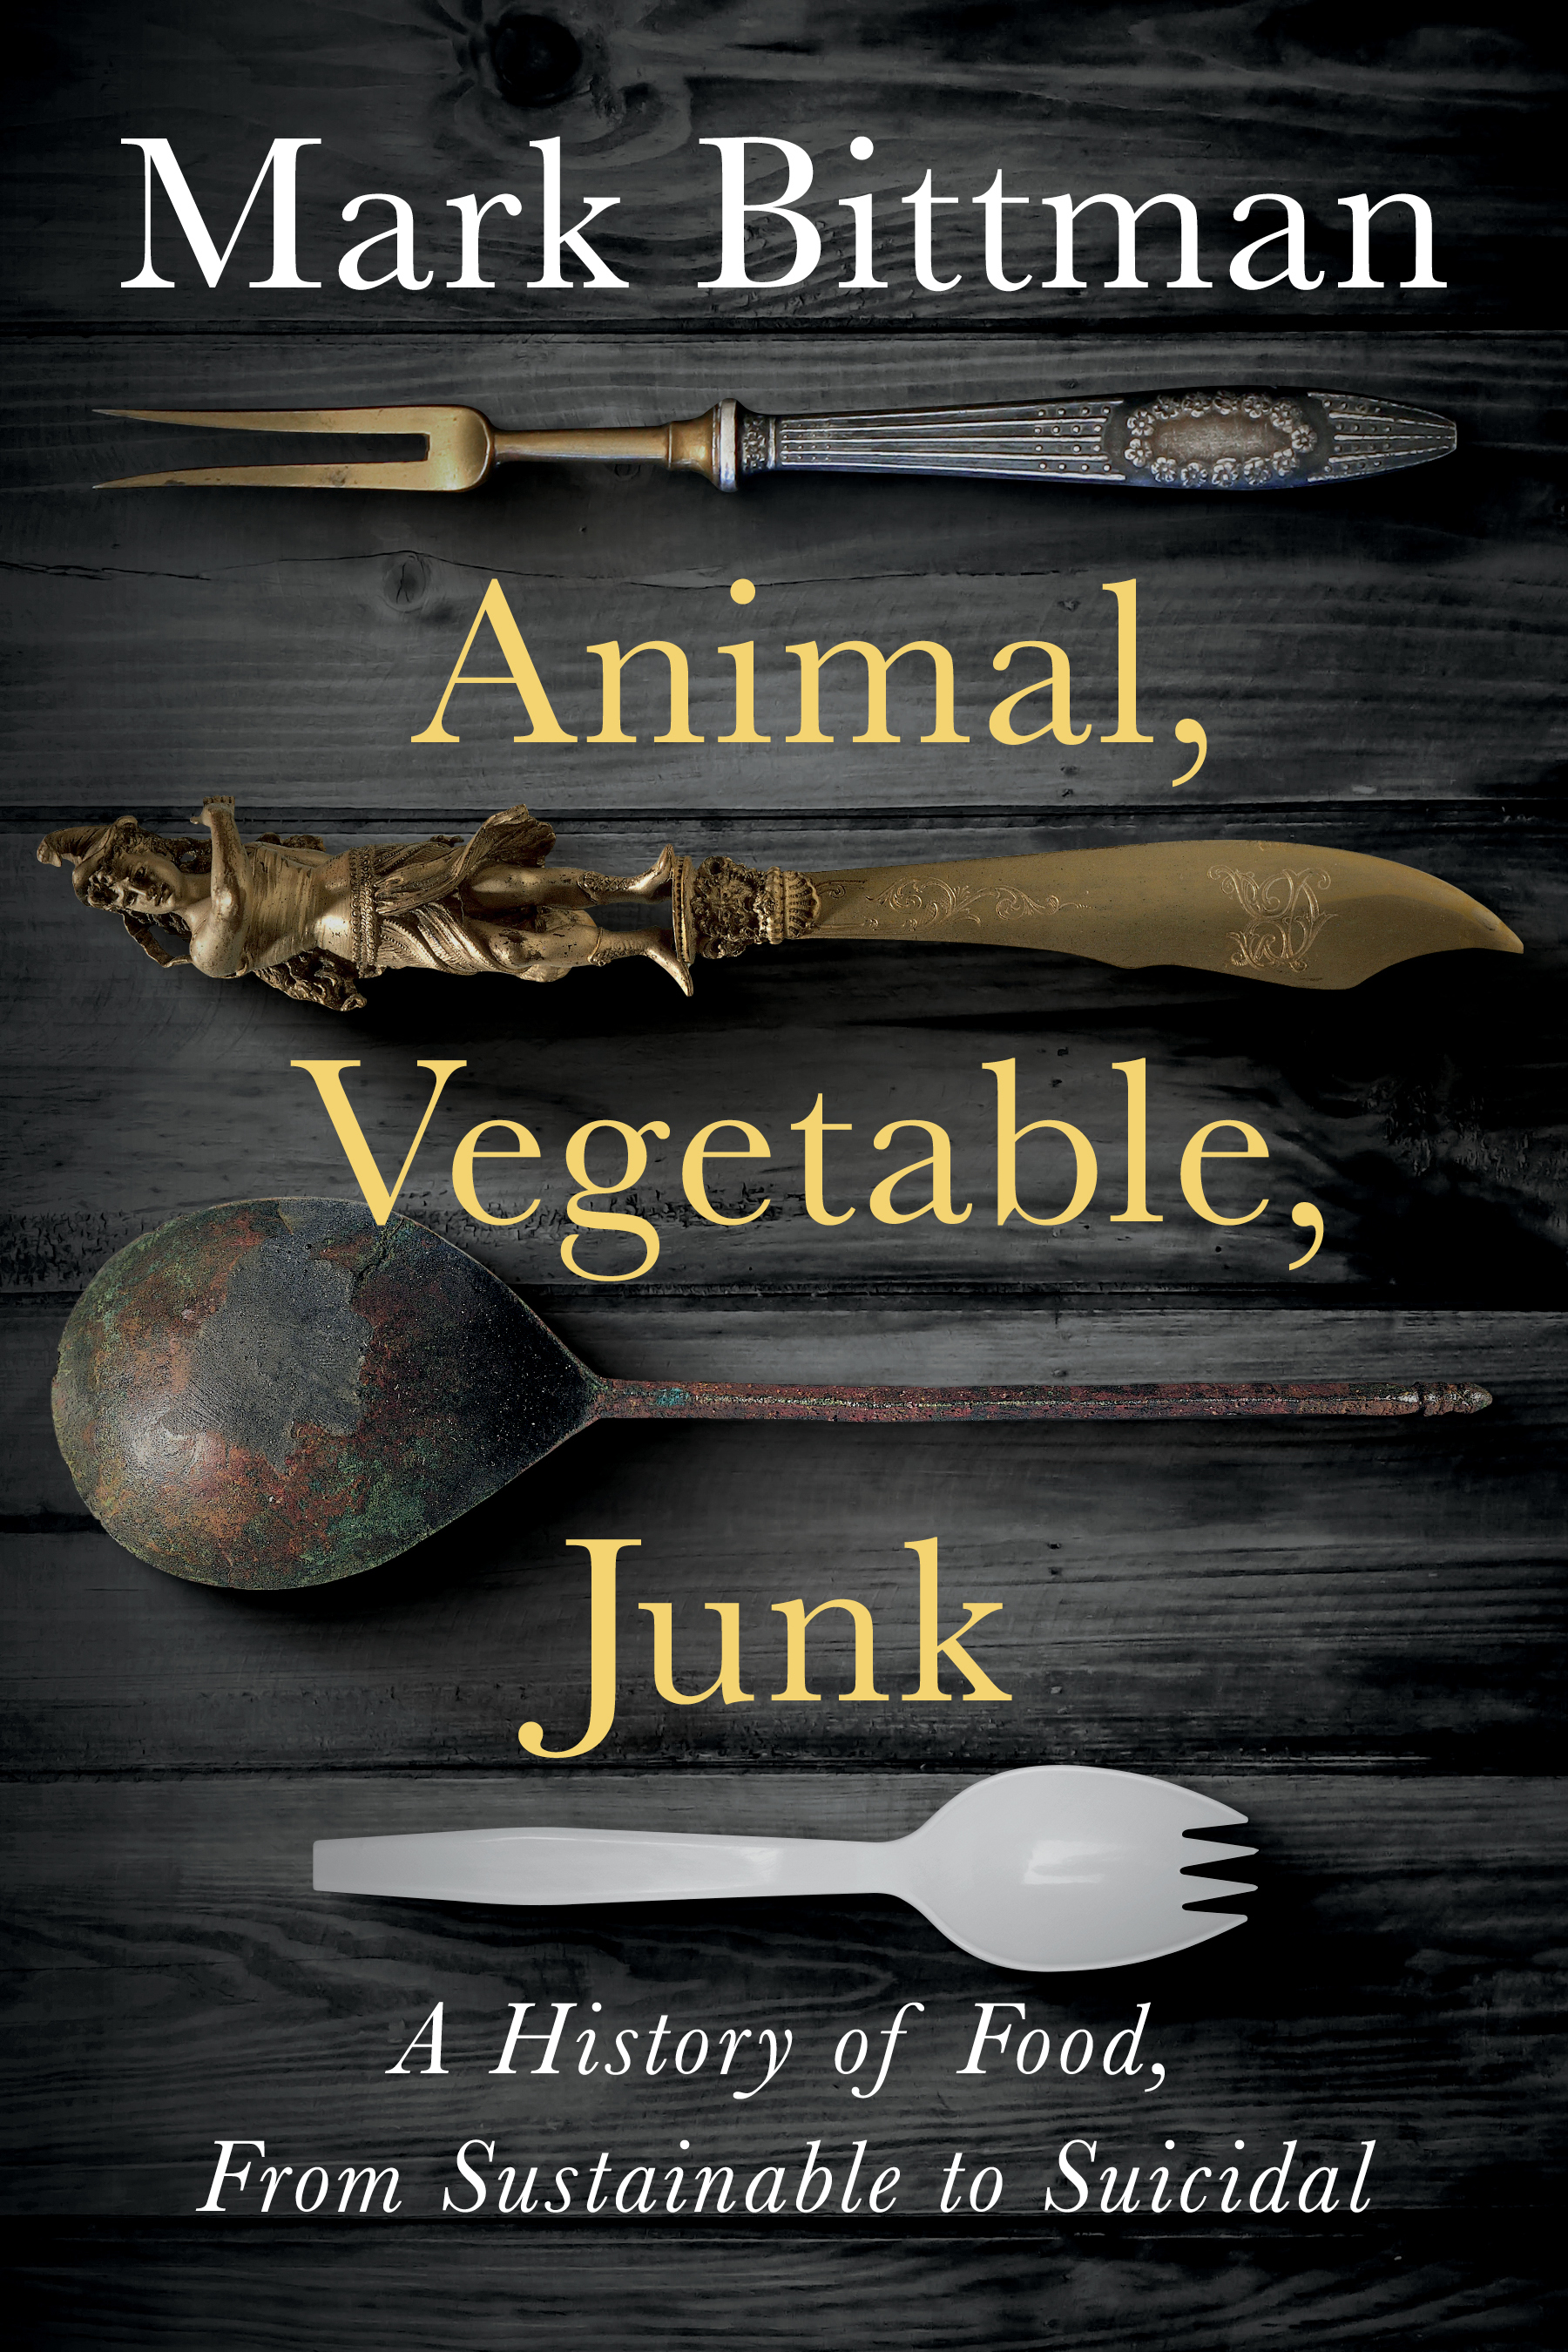 Animal, Vegetable, Junk by Mark Bittman